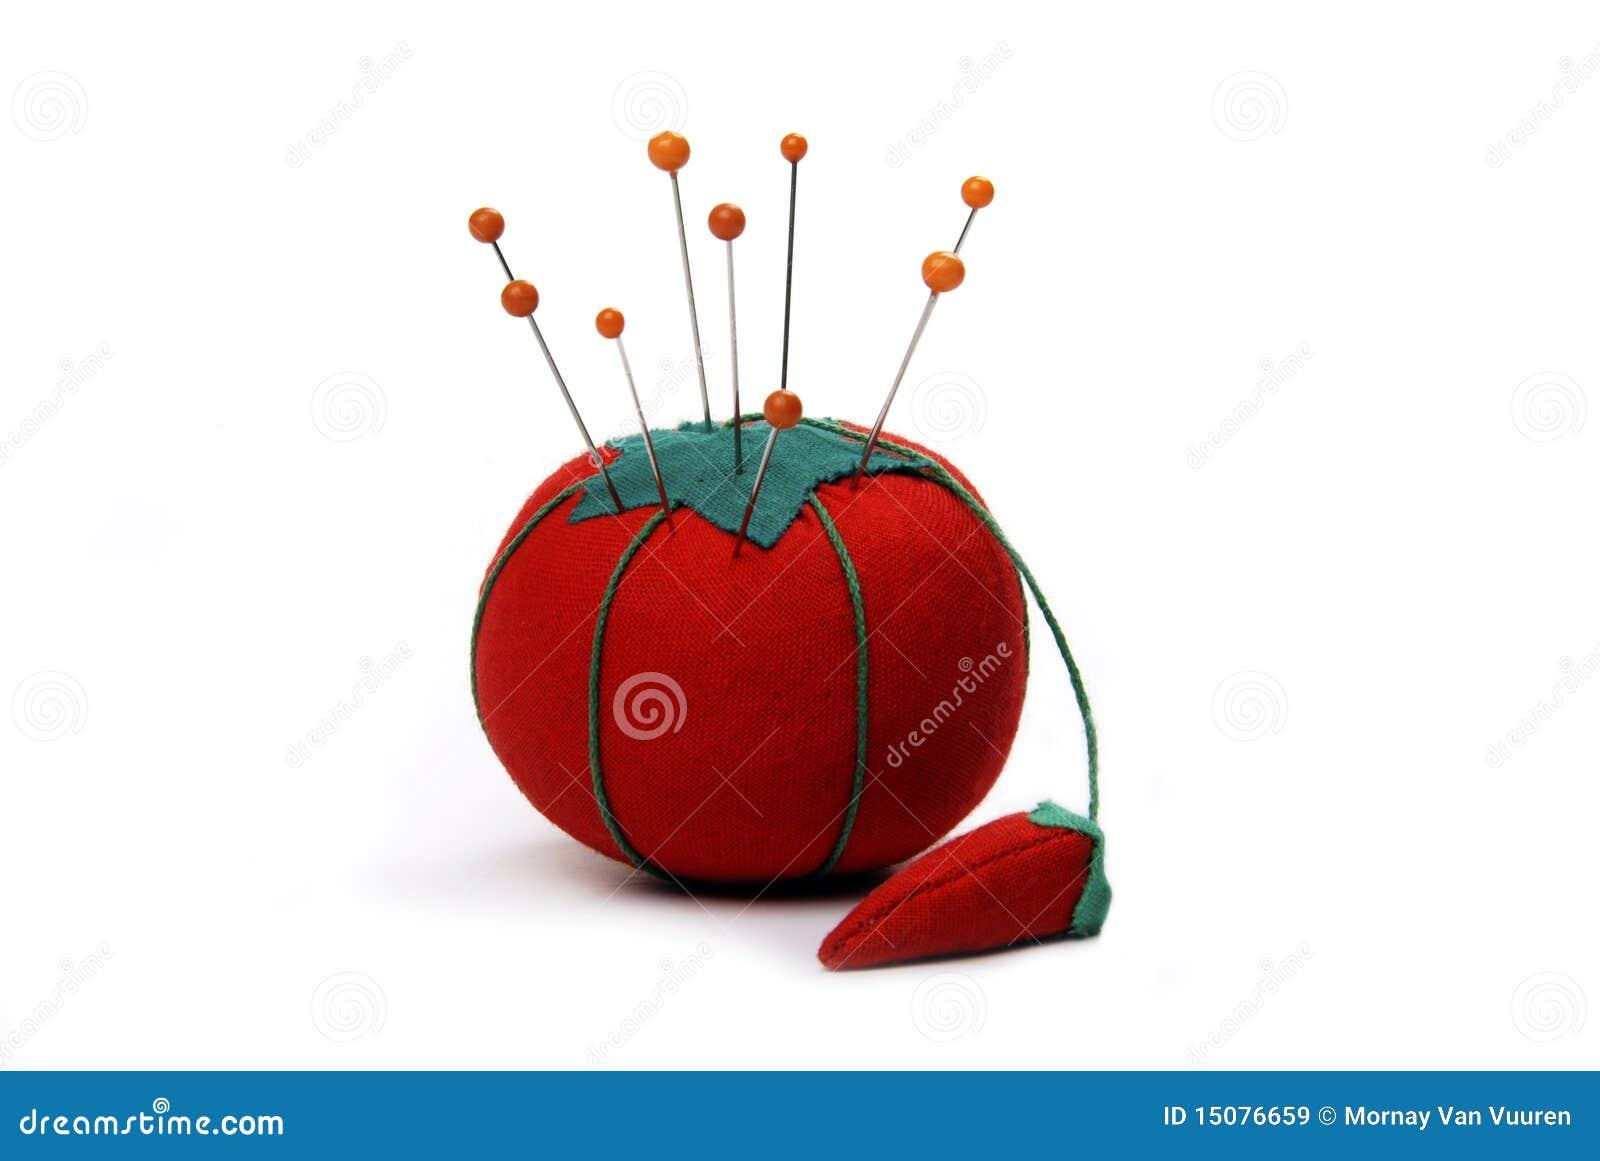 Coussin de broche de tomate